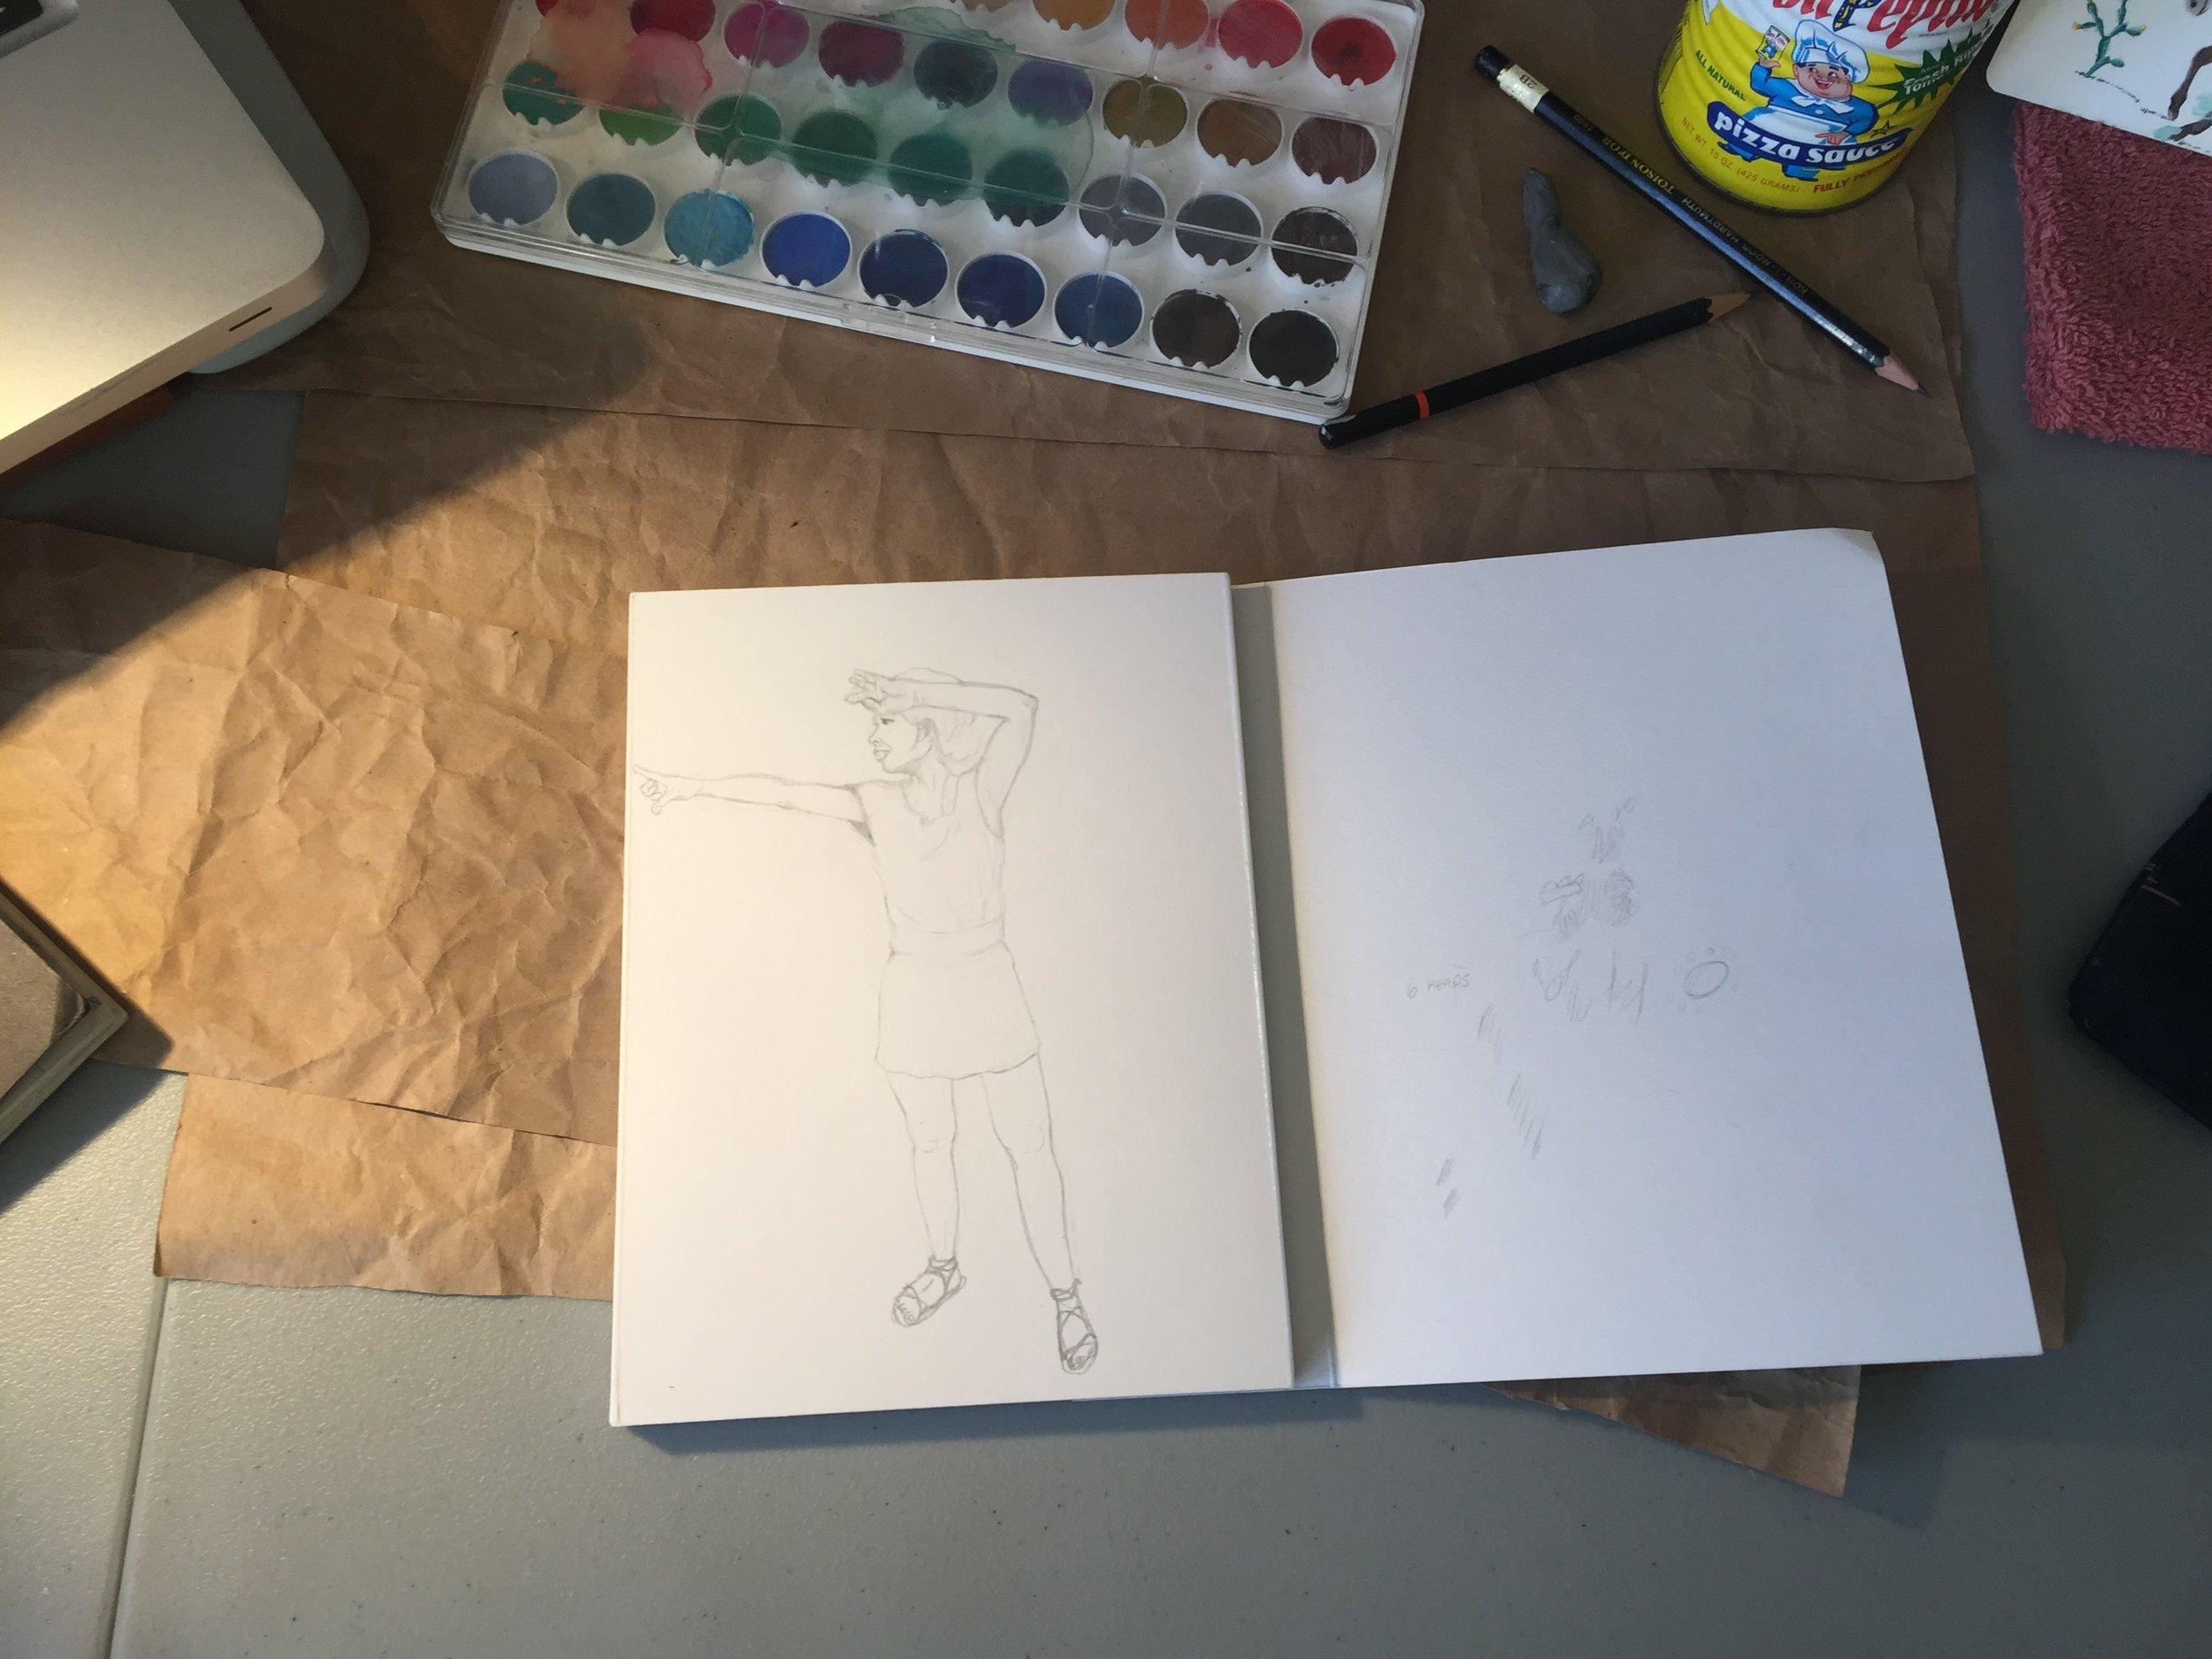 edelweiss-cardenas-a-drawing-a-day-172-2.jpg